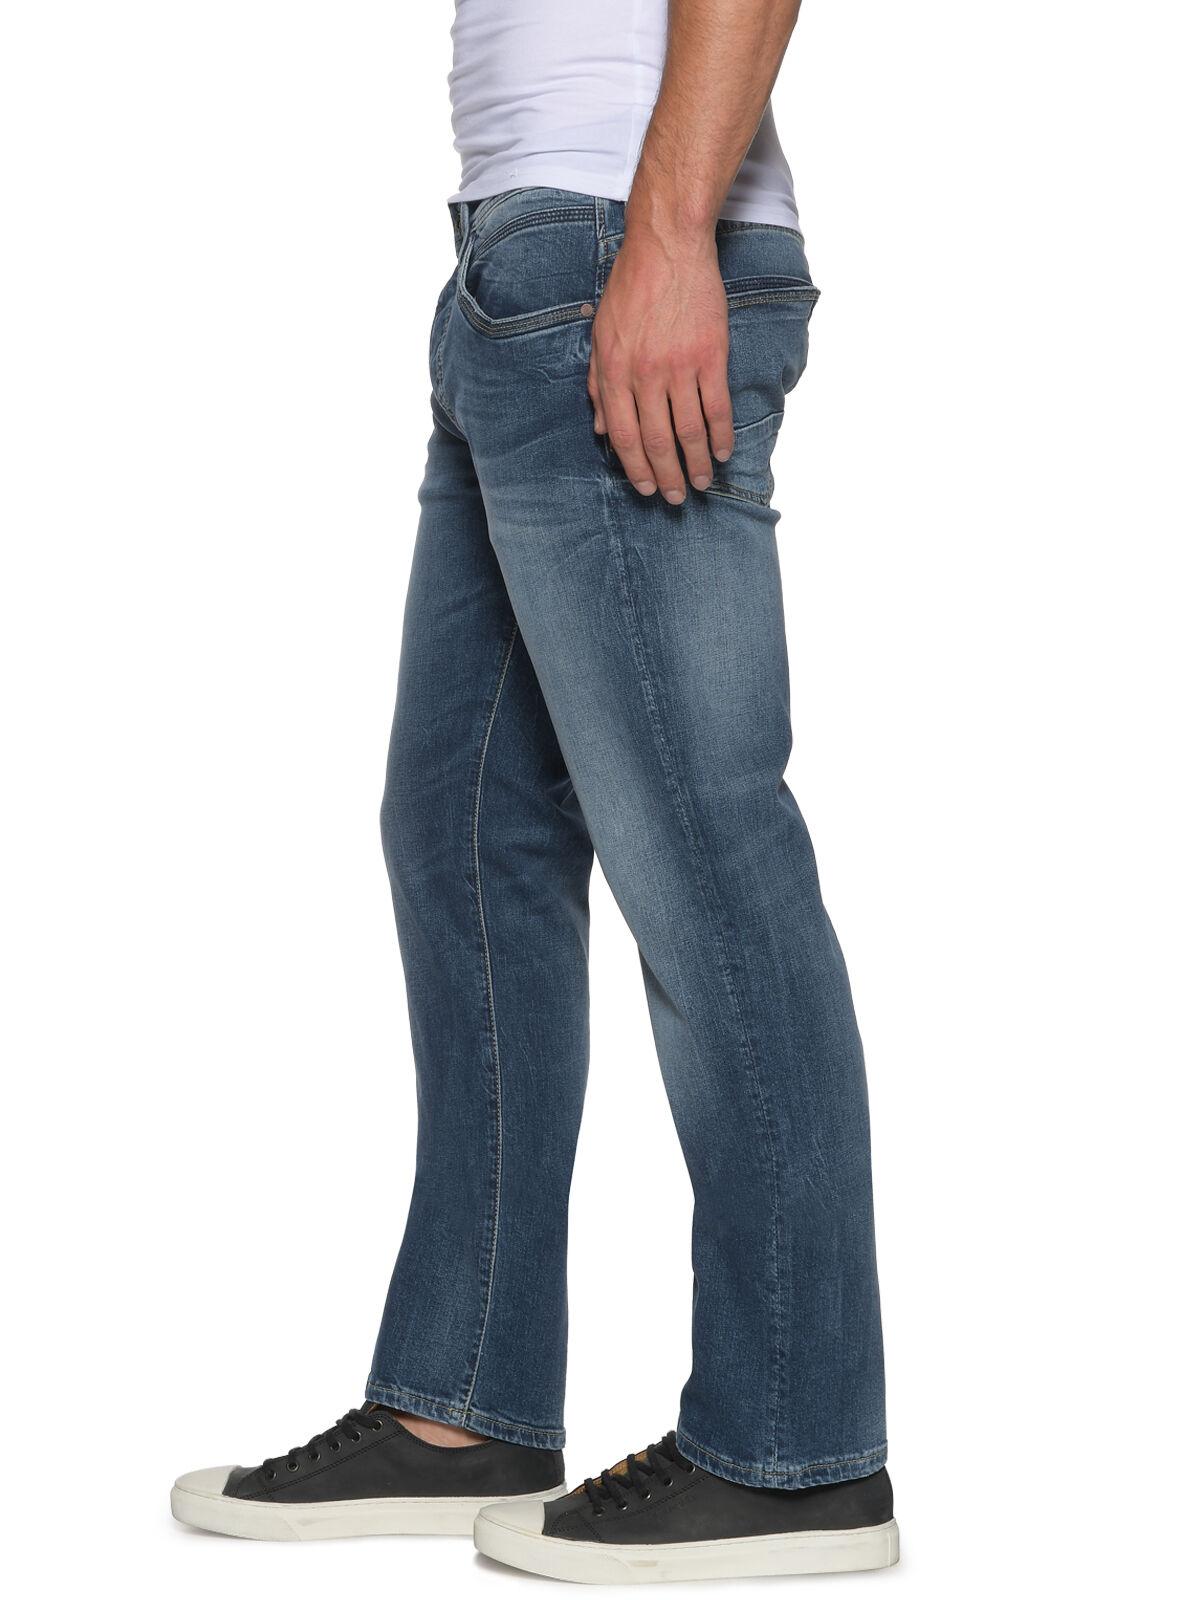 Jeanius Jeans